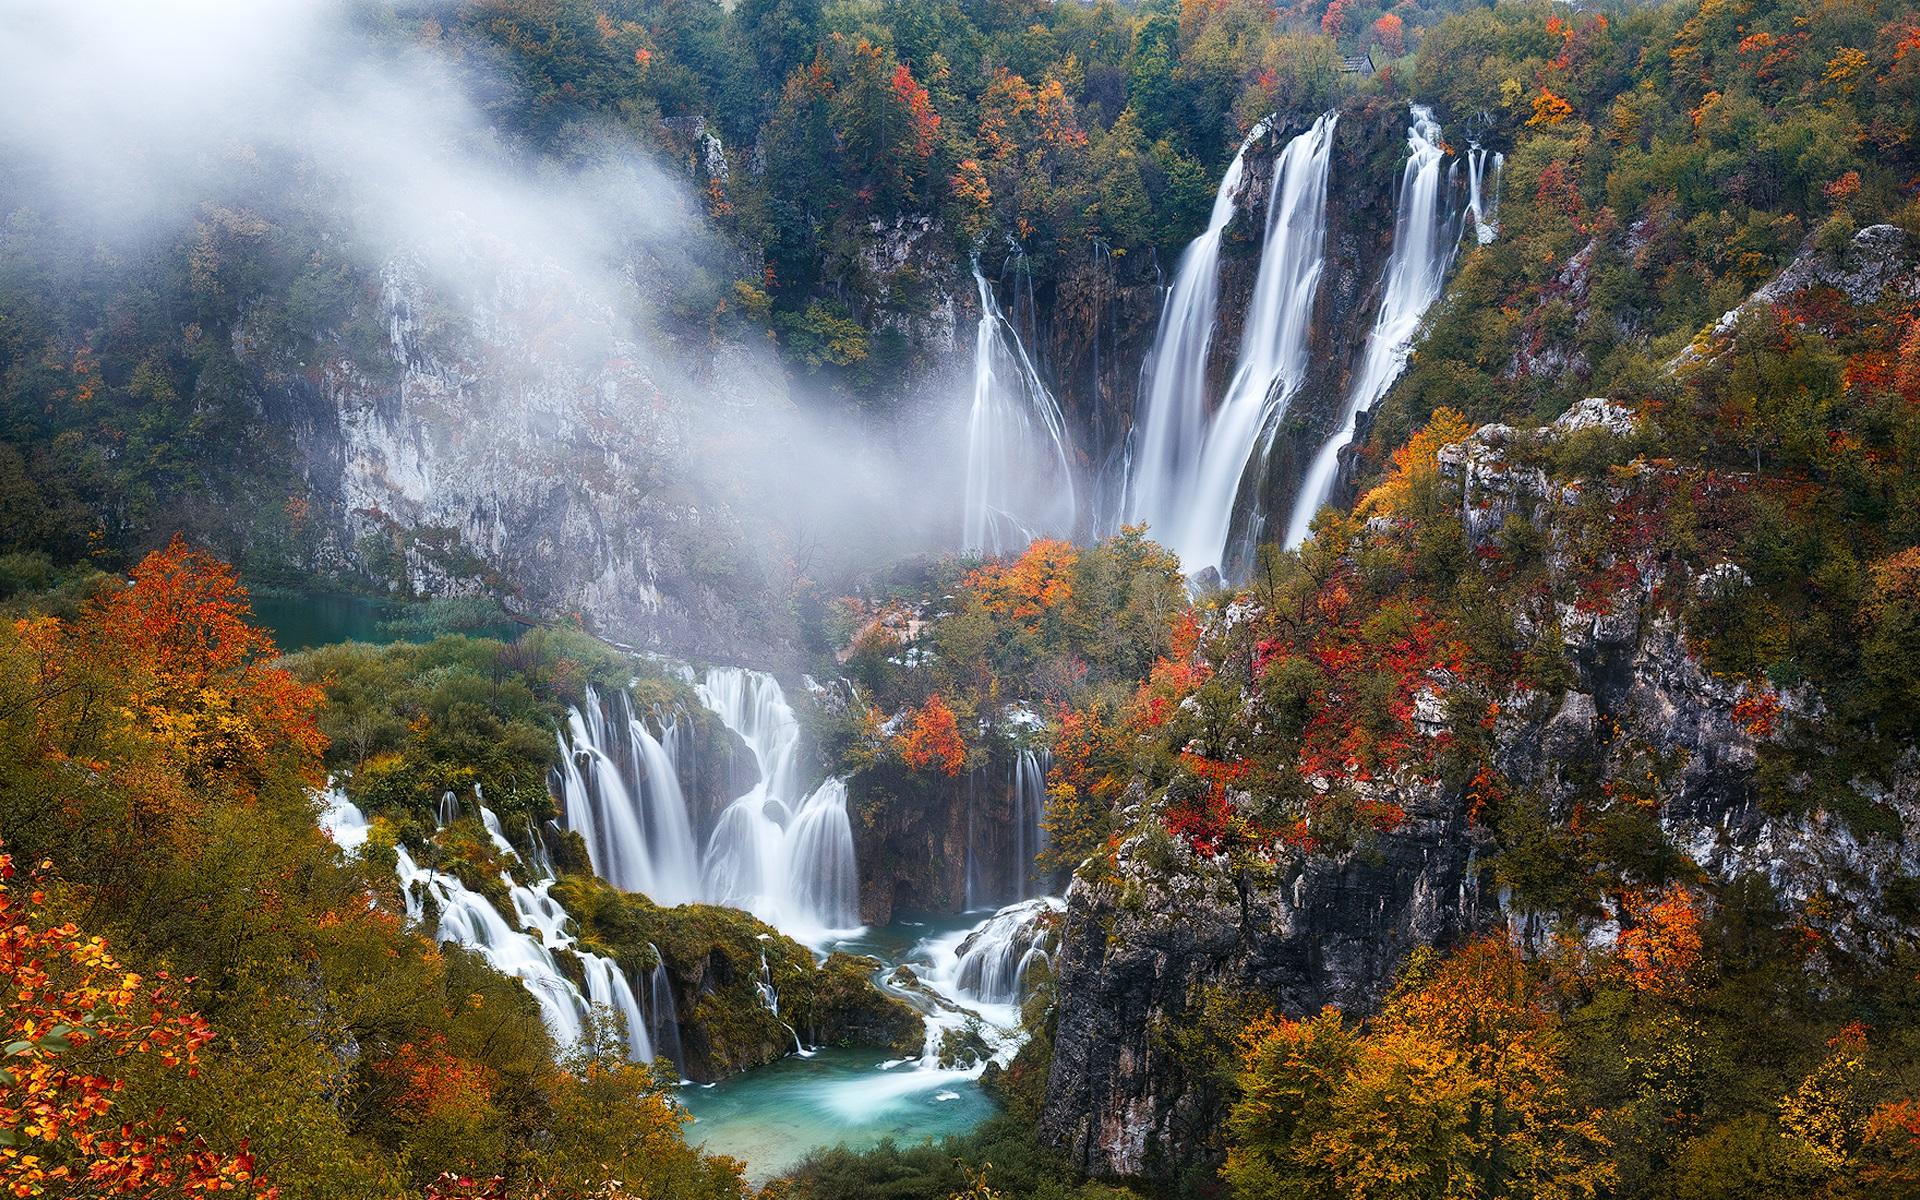 Download wallpaper 1920x1200 croatia plitvice lakes national park beautiful waterfalls autumn - Plitvice lakes hd ...